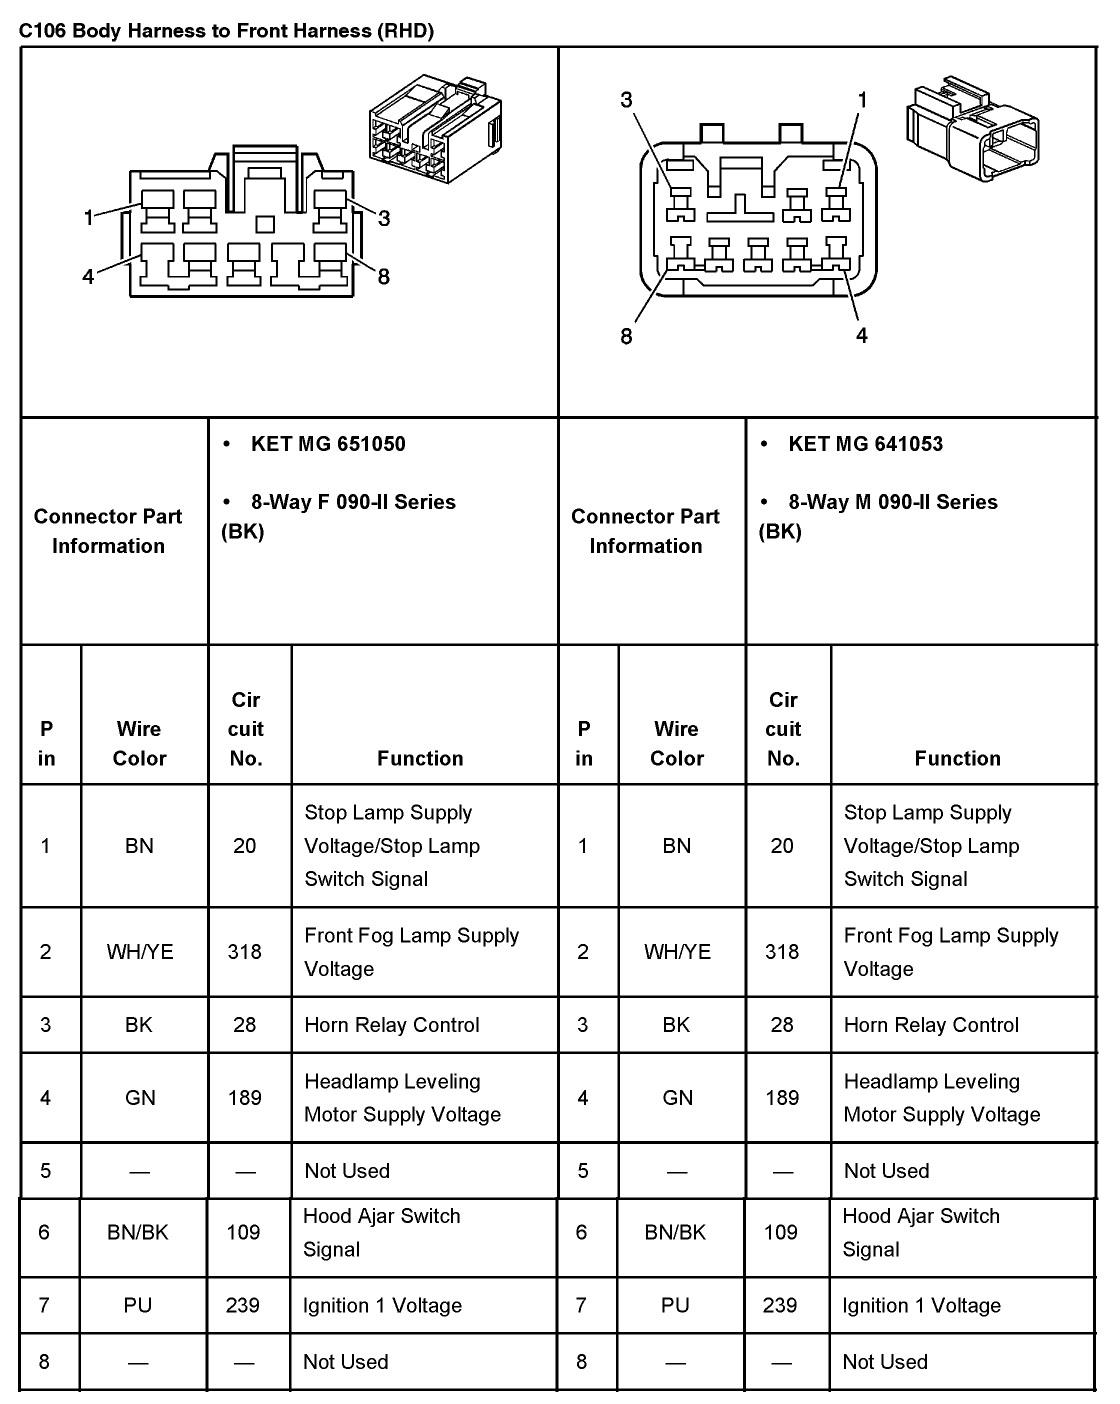 Remarkable 2006 Chevy Aveo Fuse Box Diagram Basic Electronics Wiring Diagram Wiring Cloud Icalpermsplehendilmohammedshrineorg